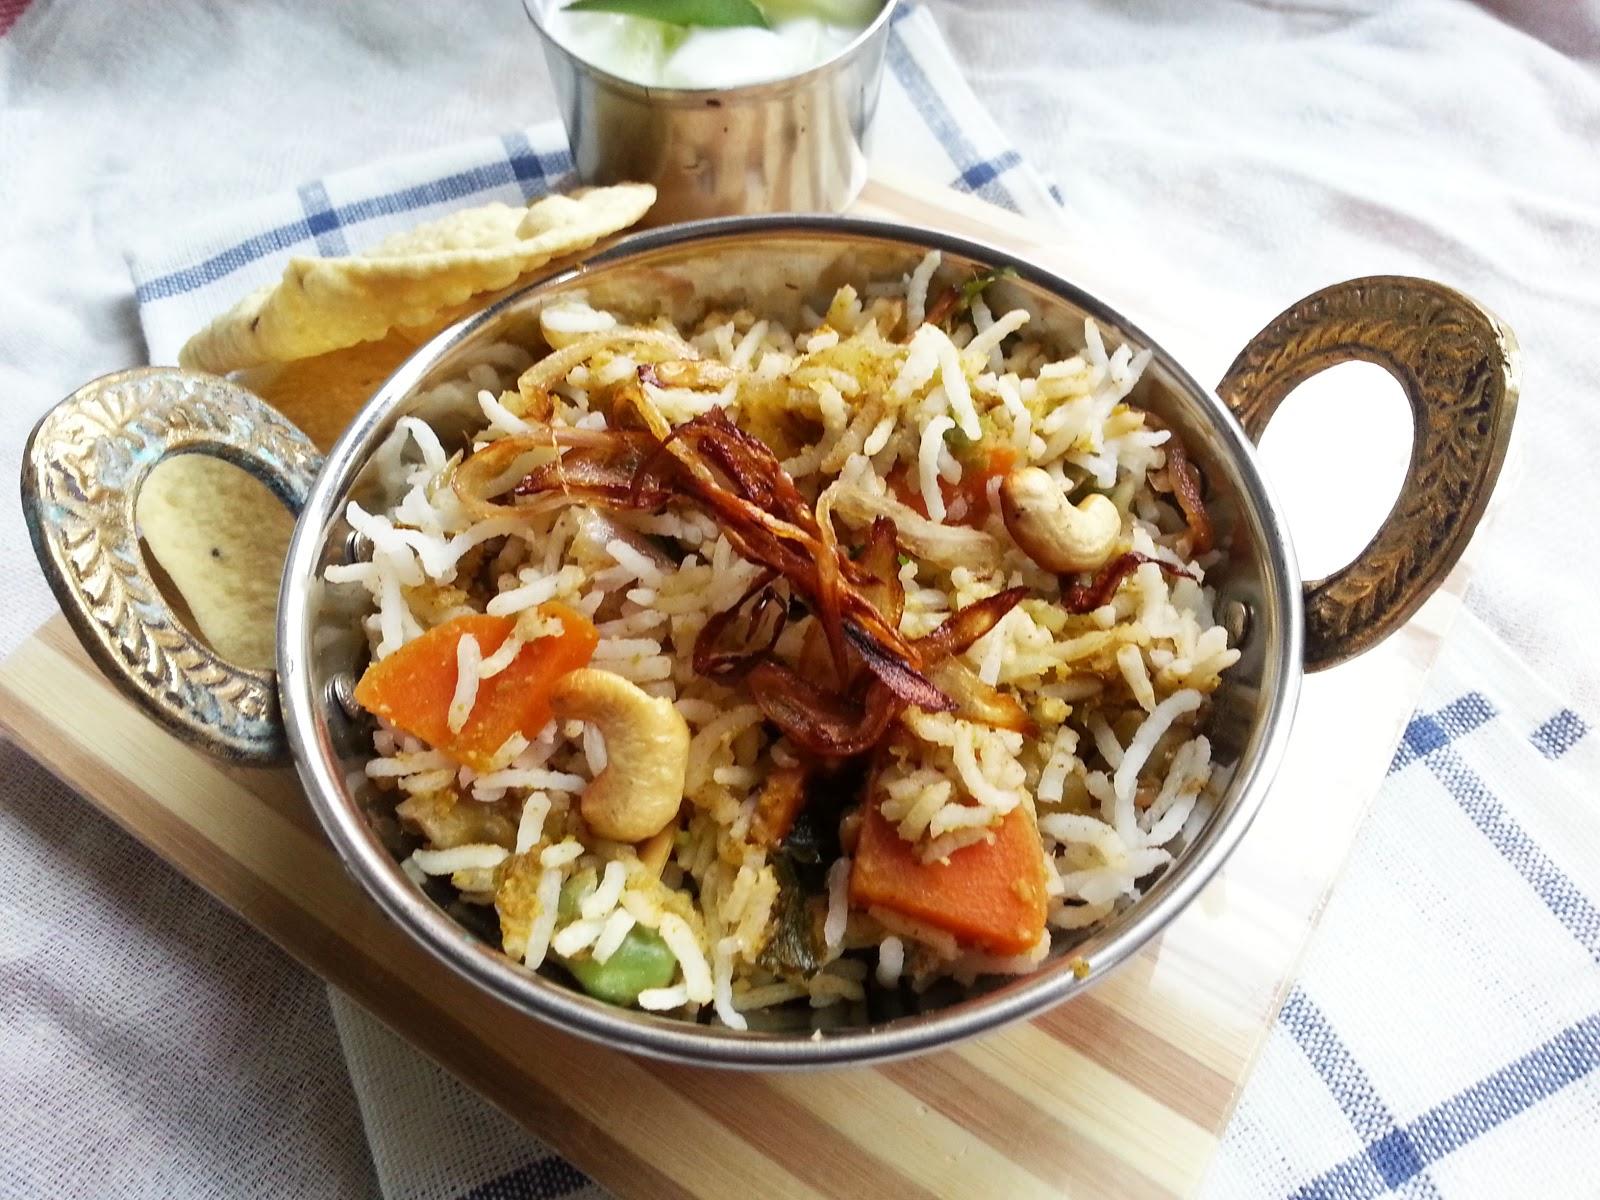 Shinies Kitchen Diary: Vegetable Biryani